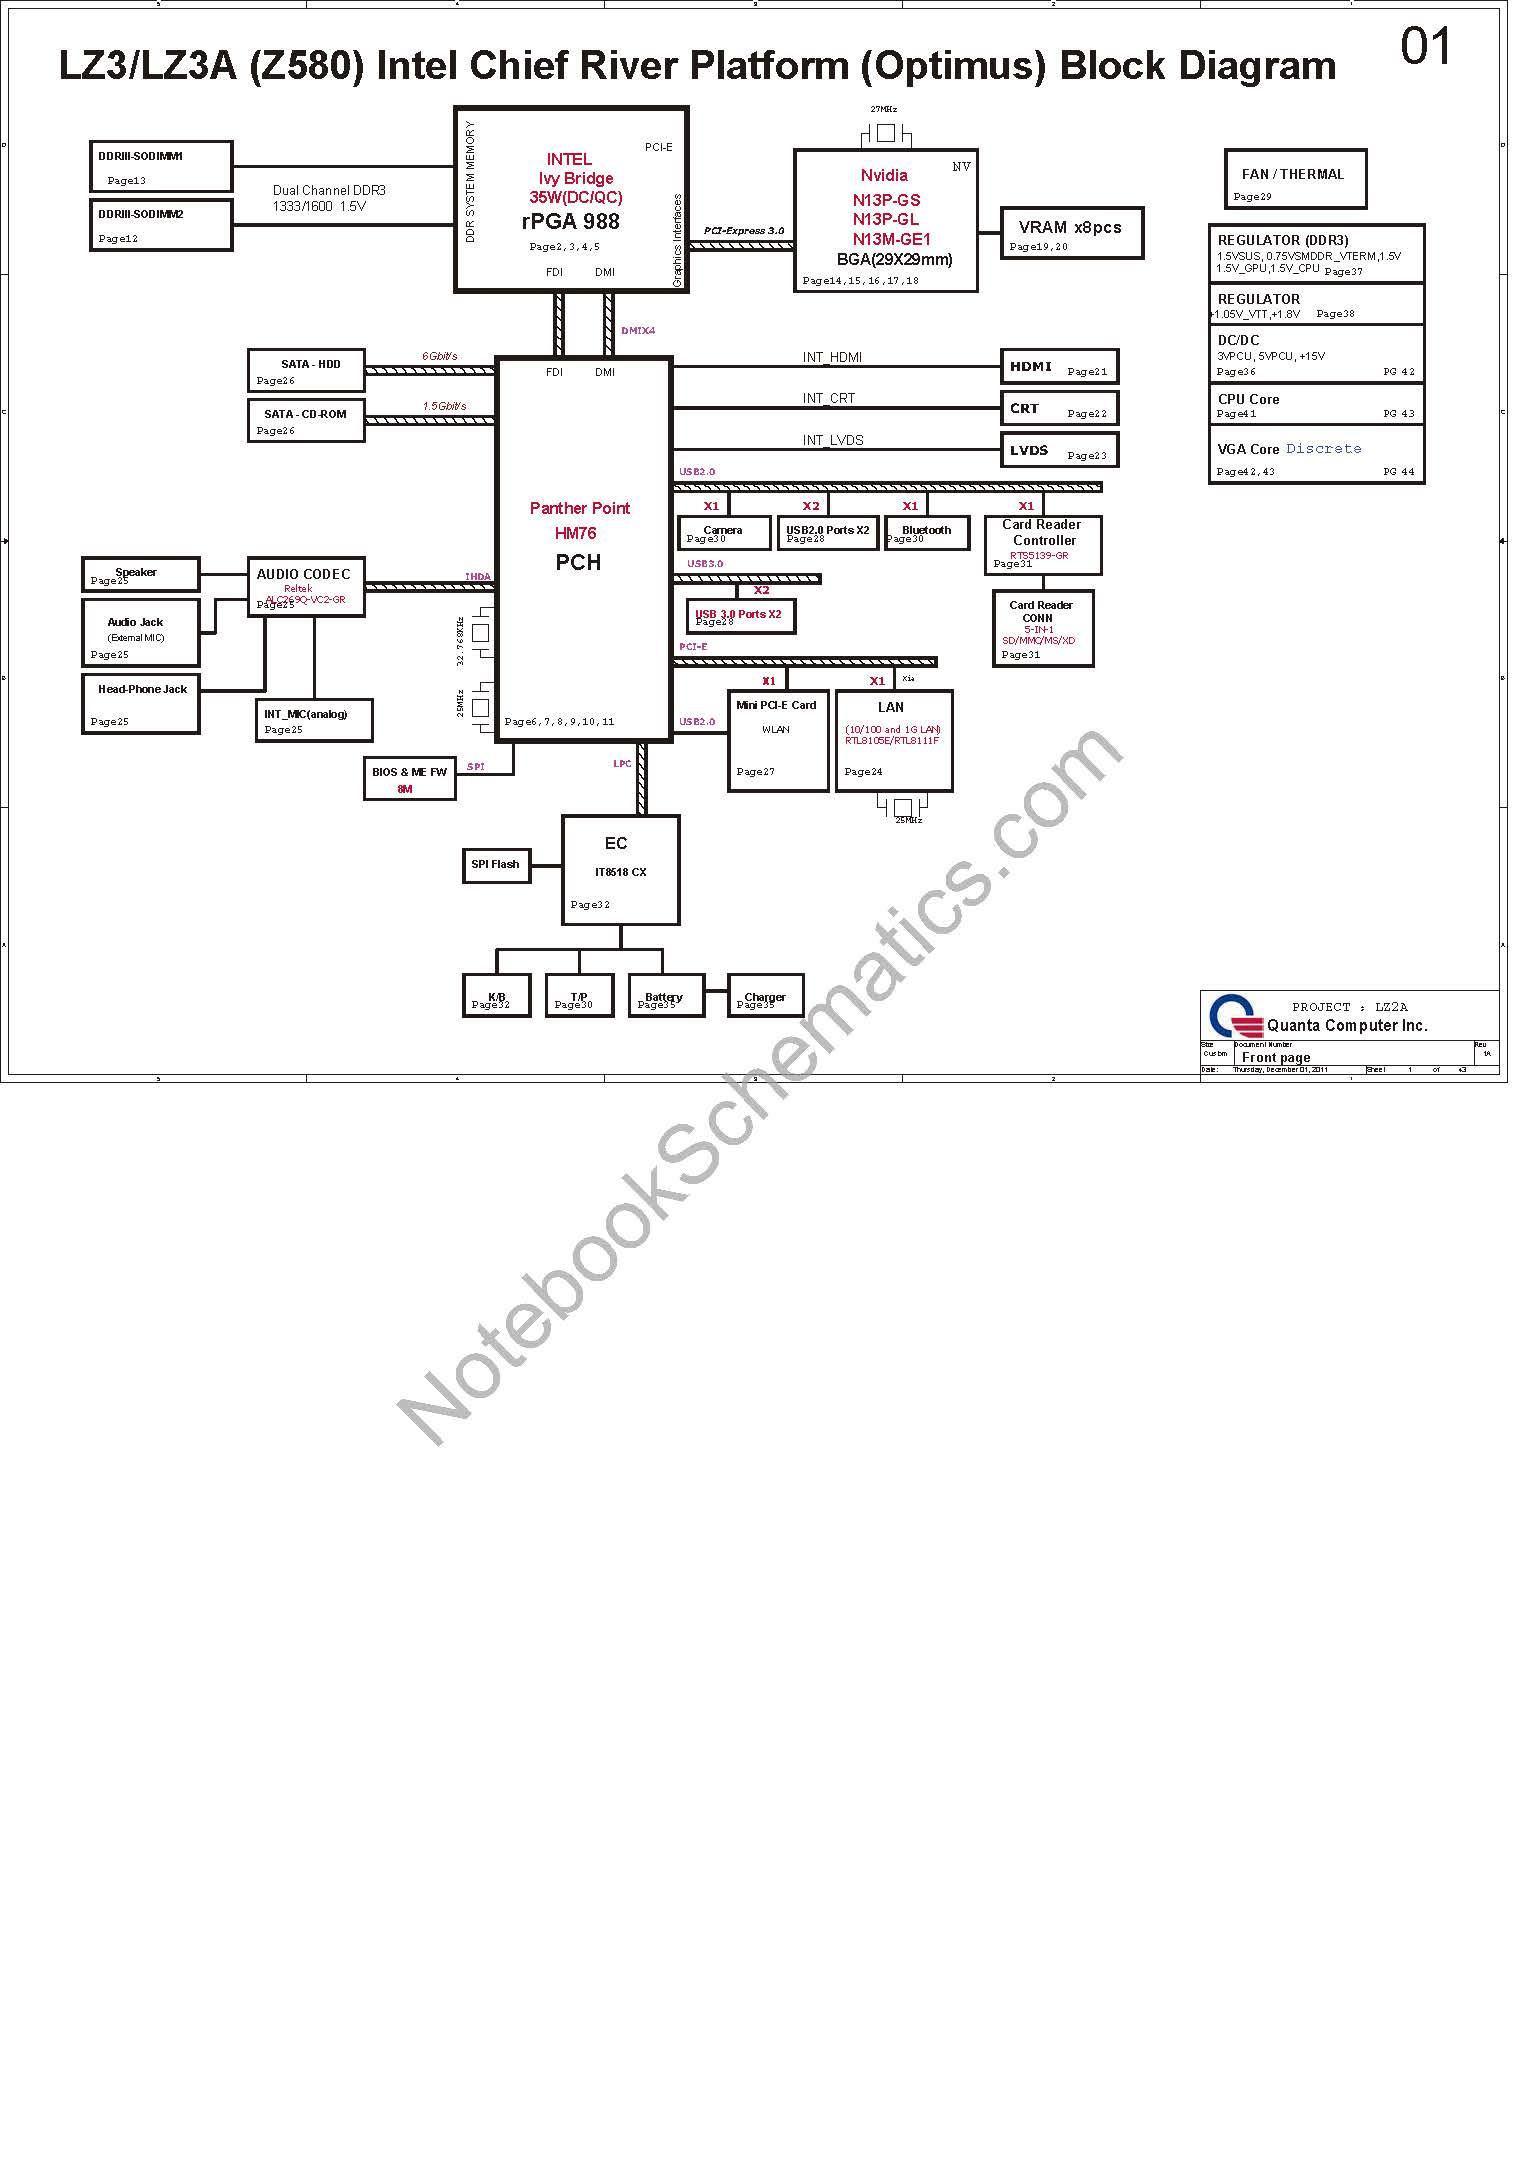 lenovo ideapad z580 schematic  u2013 da0lz3mb6g0  u2013 dalz3amb8e0  u2013 lenovo lz3  lz3a m  b schematic